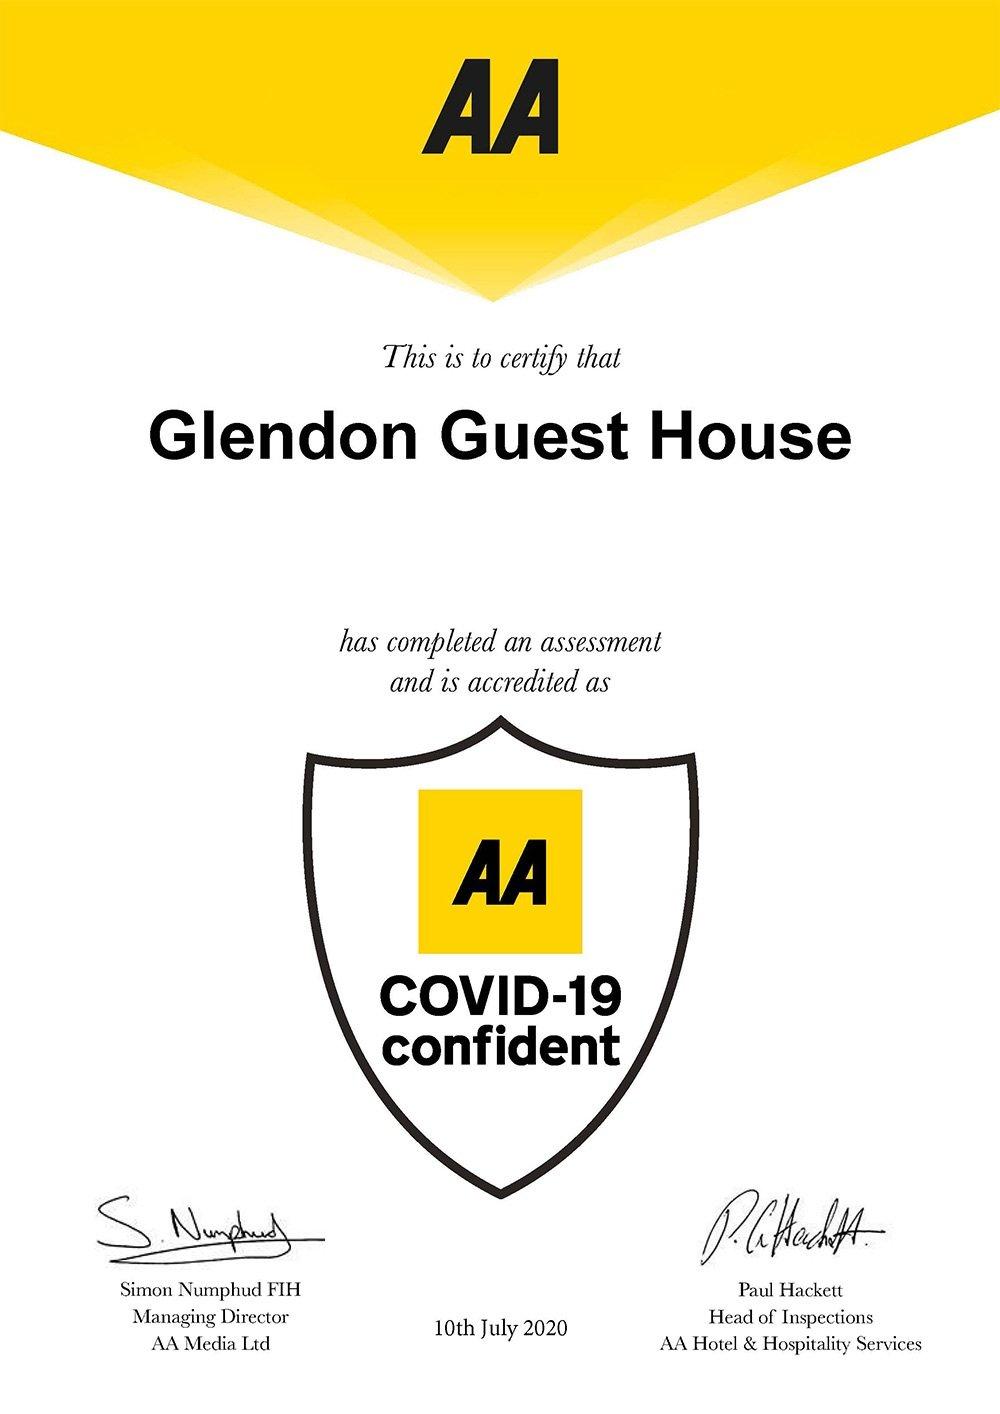 AA Covid-19 confident certificate